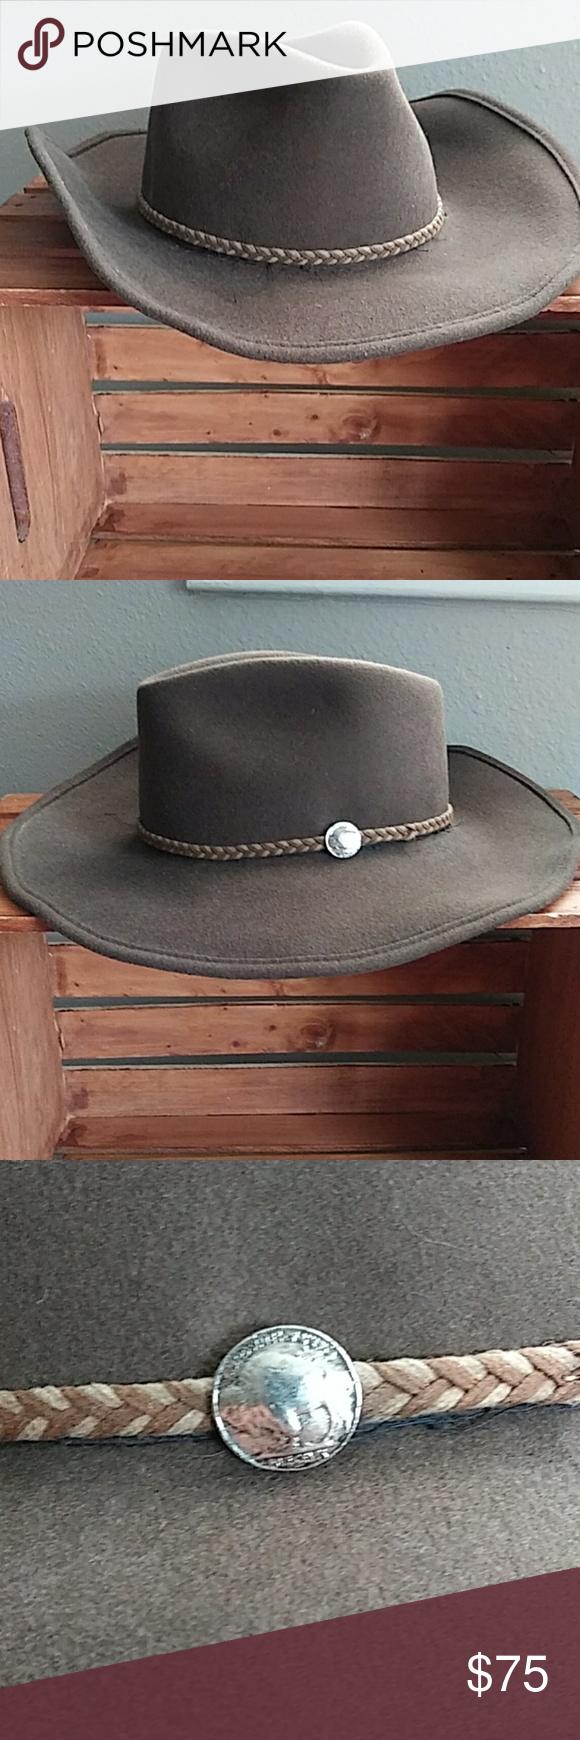 Brown 100 Wool Stetson Hat Stetson Hat Stetson Hats